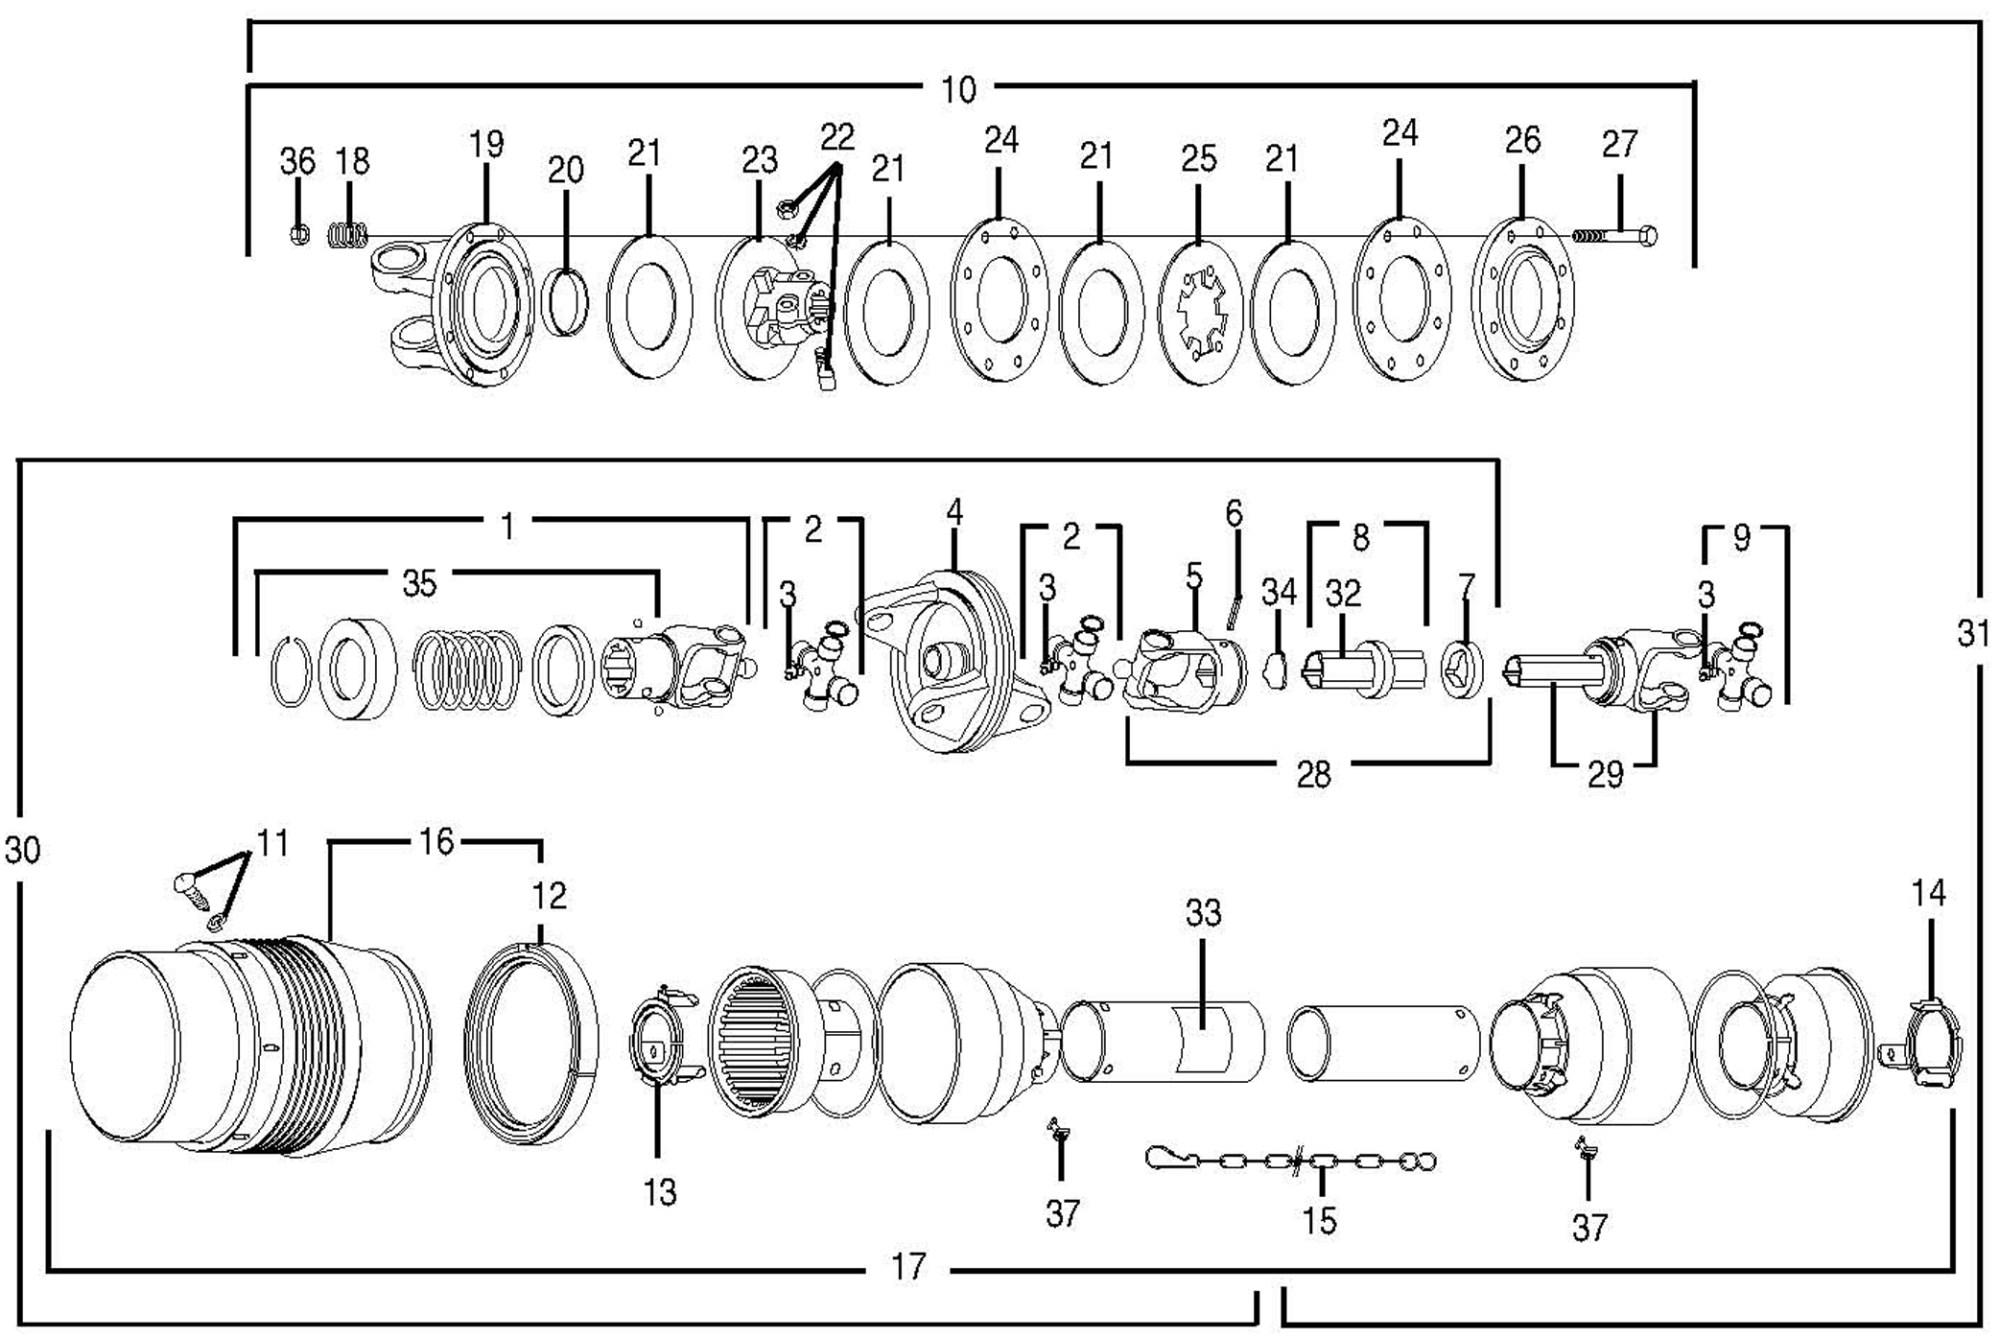 hight resolution of bush hog 2010 12010 rotary cutter parts 2010 12010 rotary cutter brush hog chain guard brush hog clutch diagram